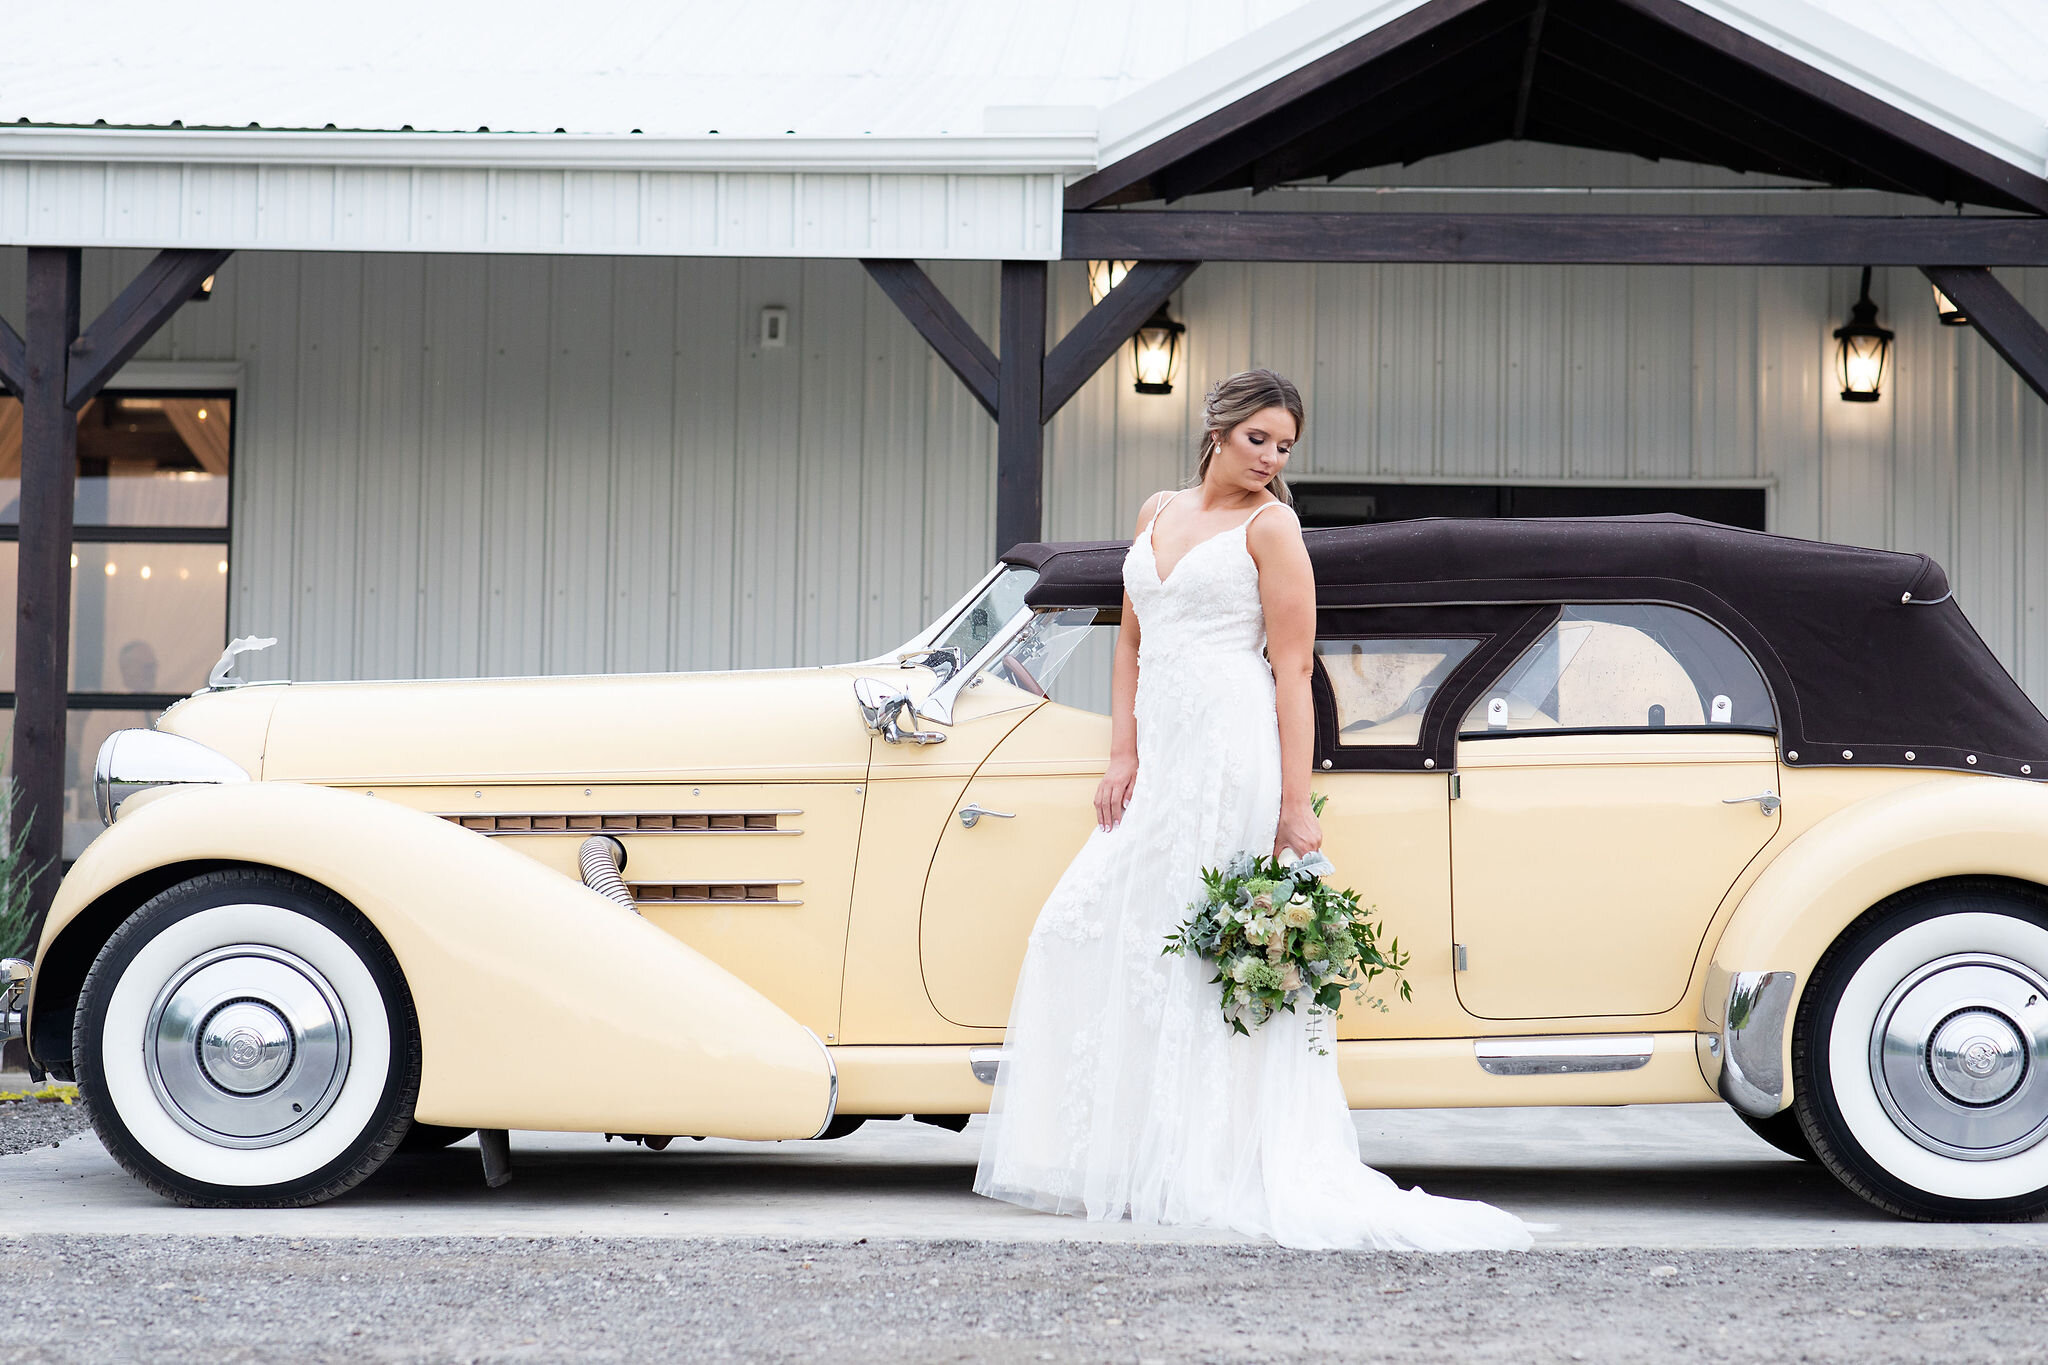 Oklahoma Summer Wedding Venue Dream Point Ranch 13e.jpg